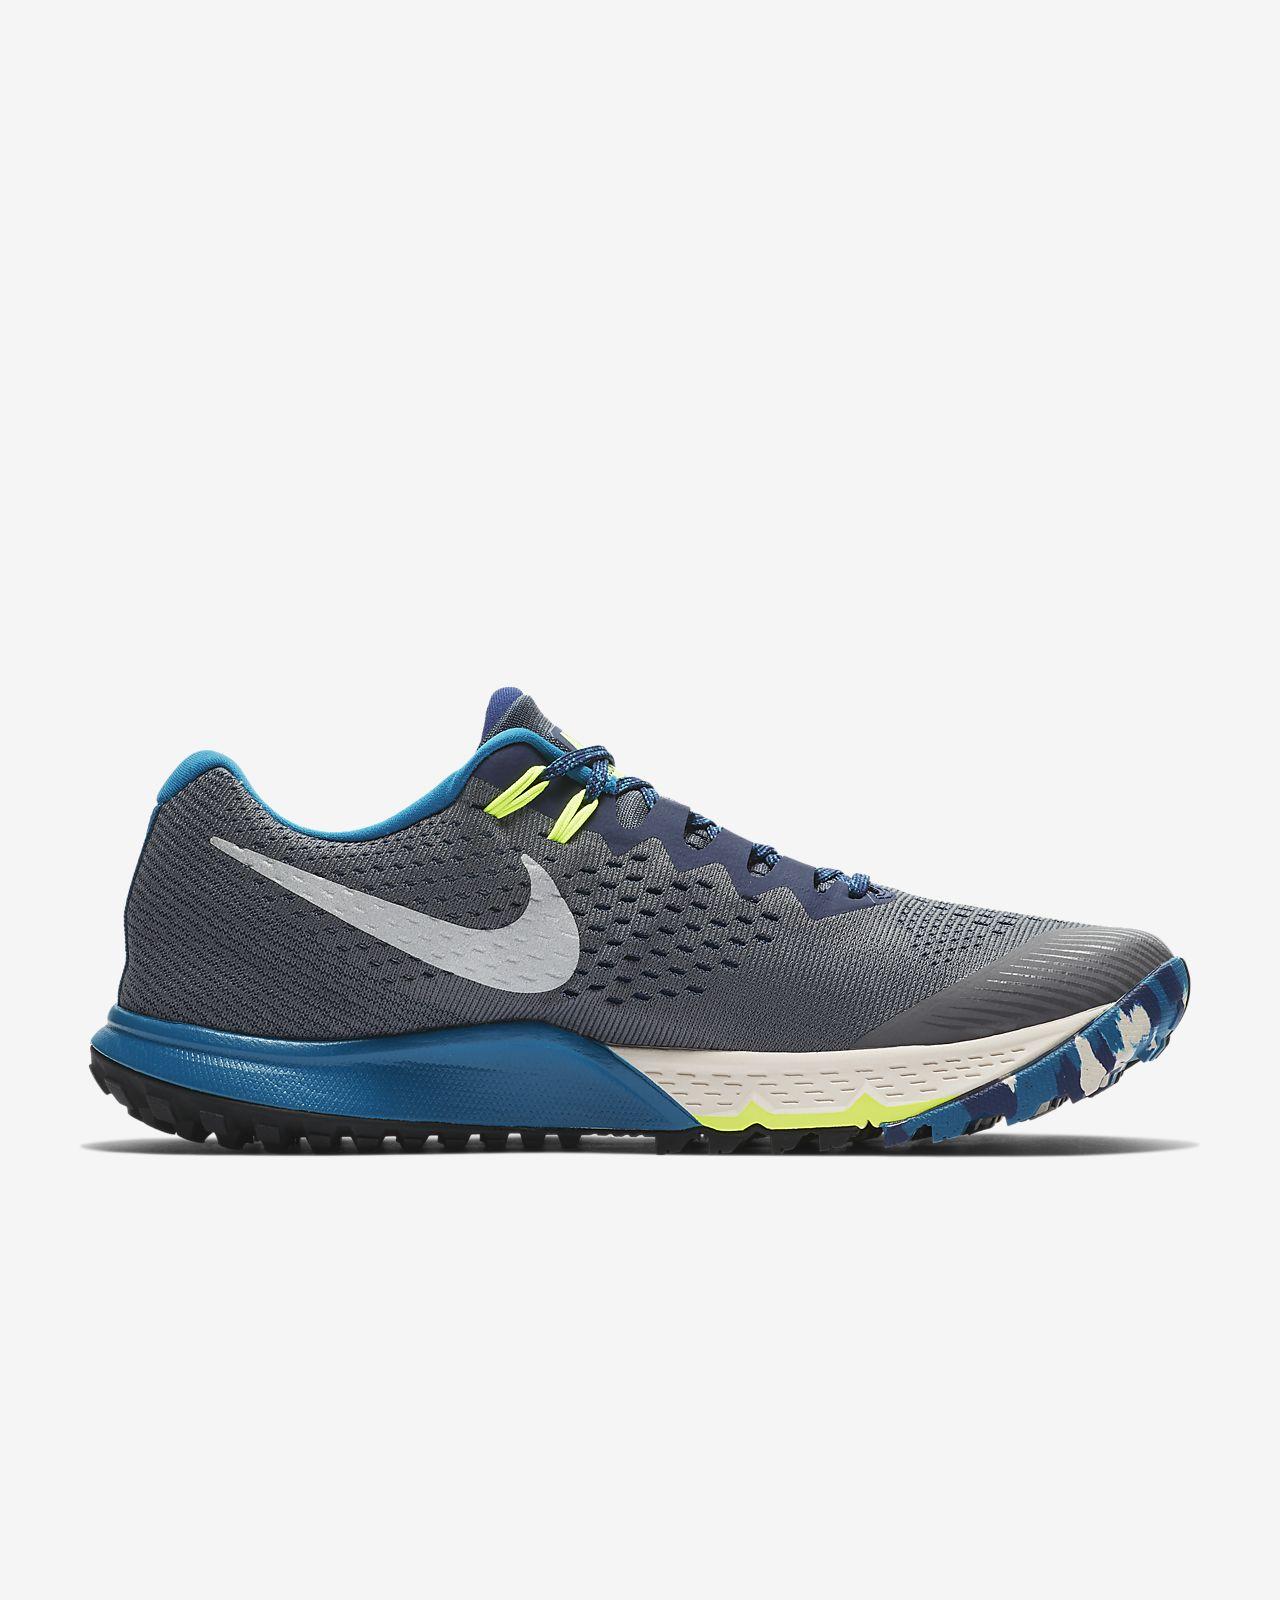 ef1a59909a6 Nike Air Zoom Terra Kiger 4 Men s Running Shoe. Nike.com GB